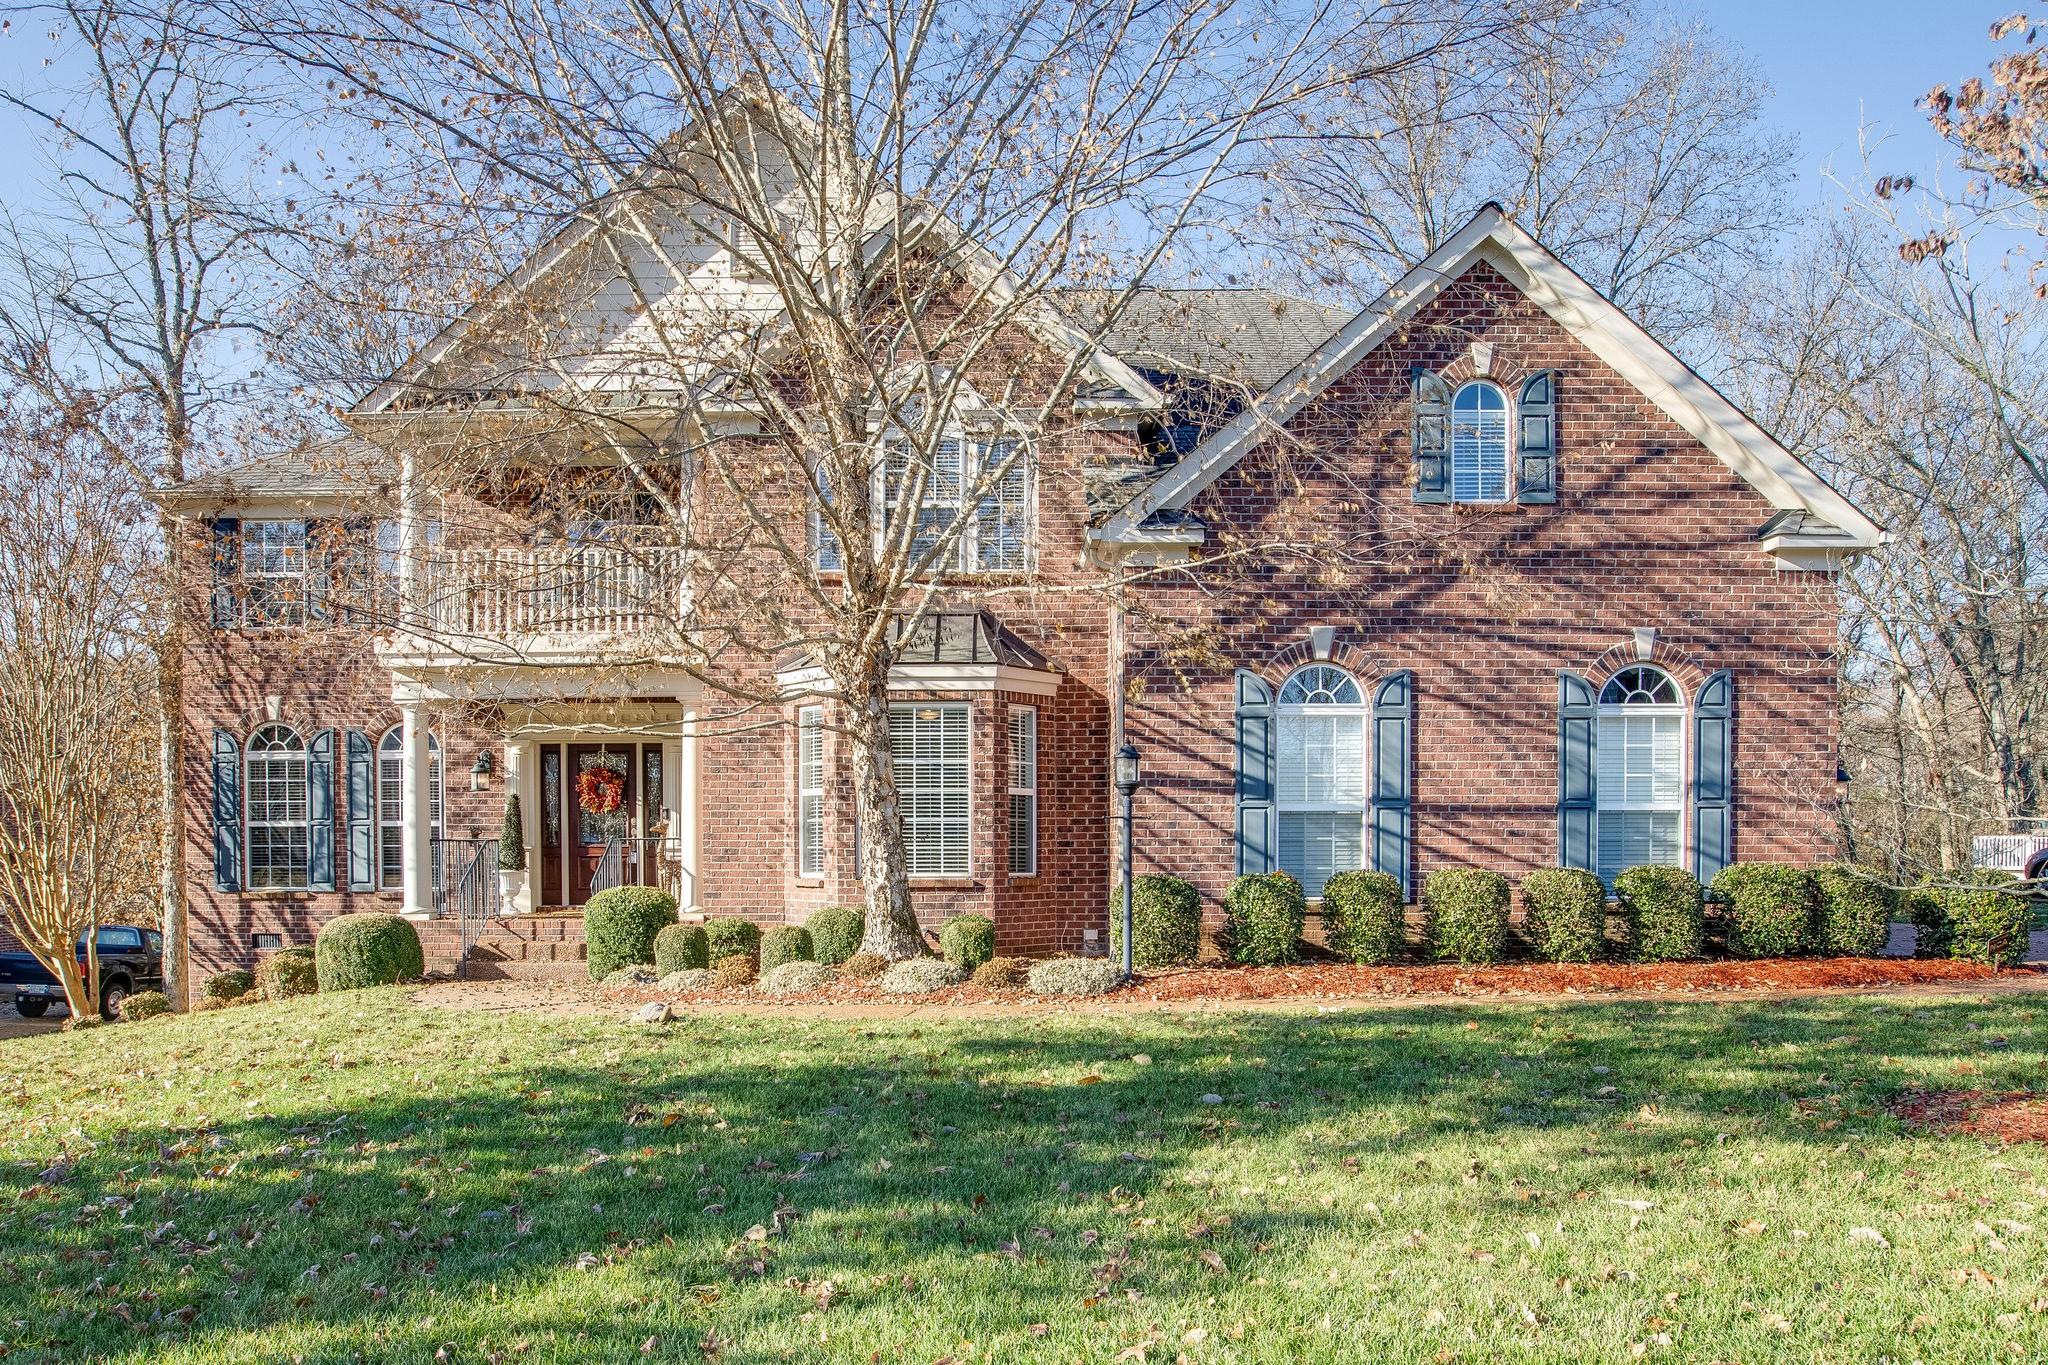 5069 Abington Ridge Ln, Franklin, TN 37067 - Franklin, TN real estate listing